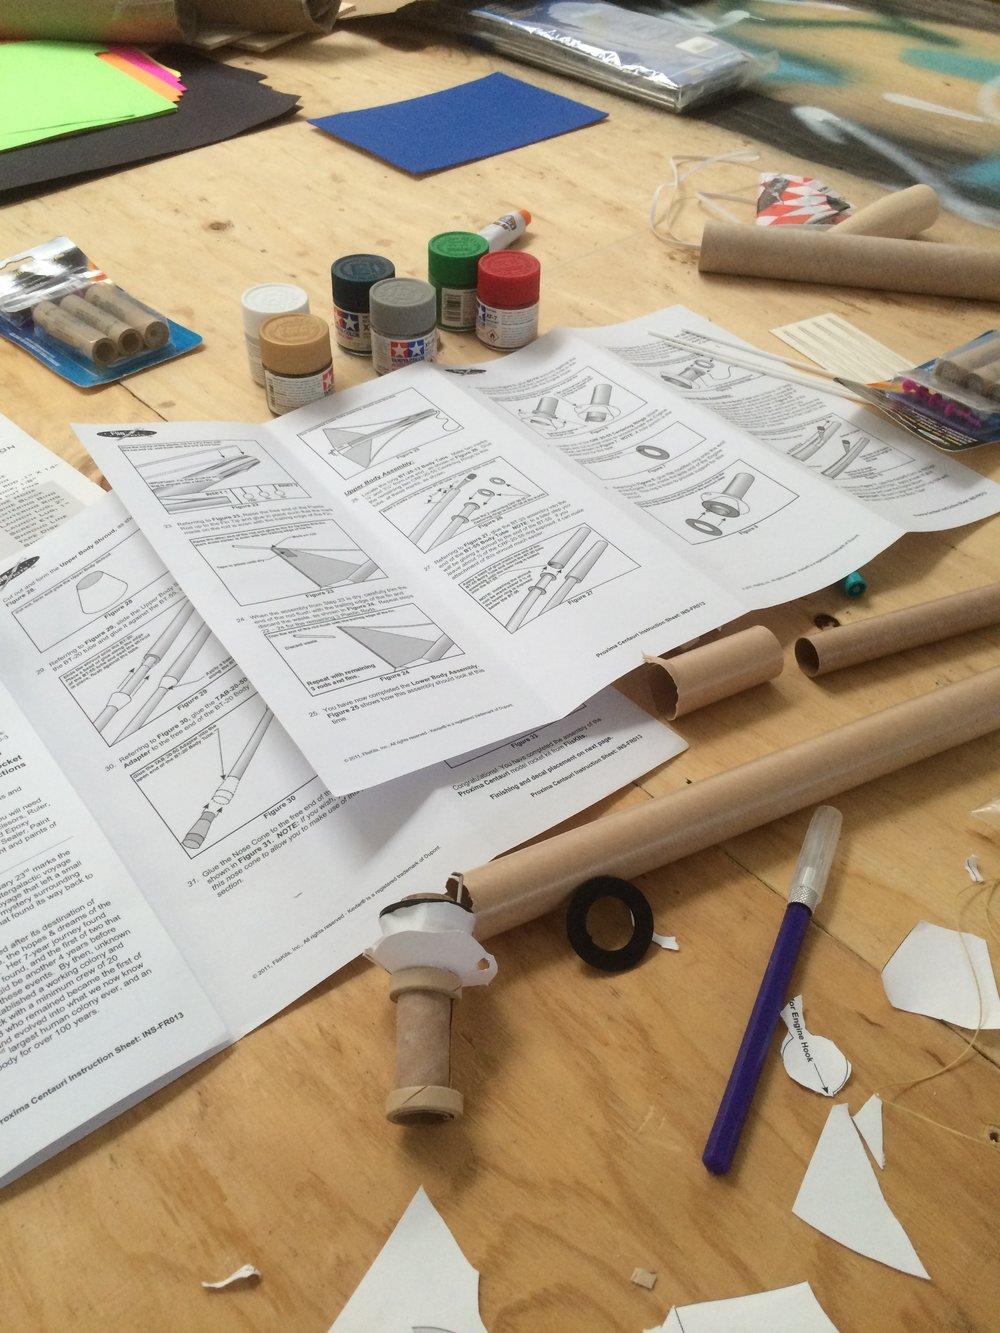 Model rocket mess!